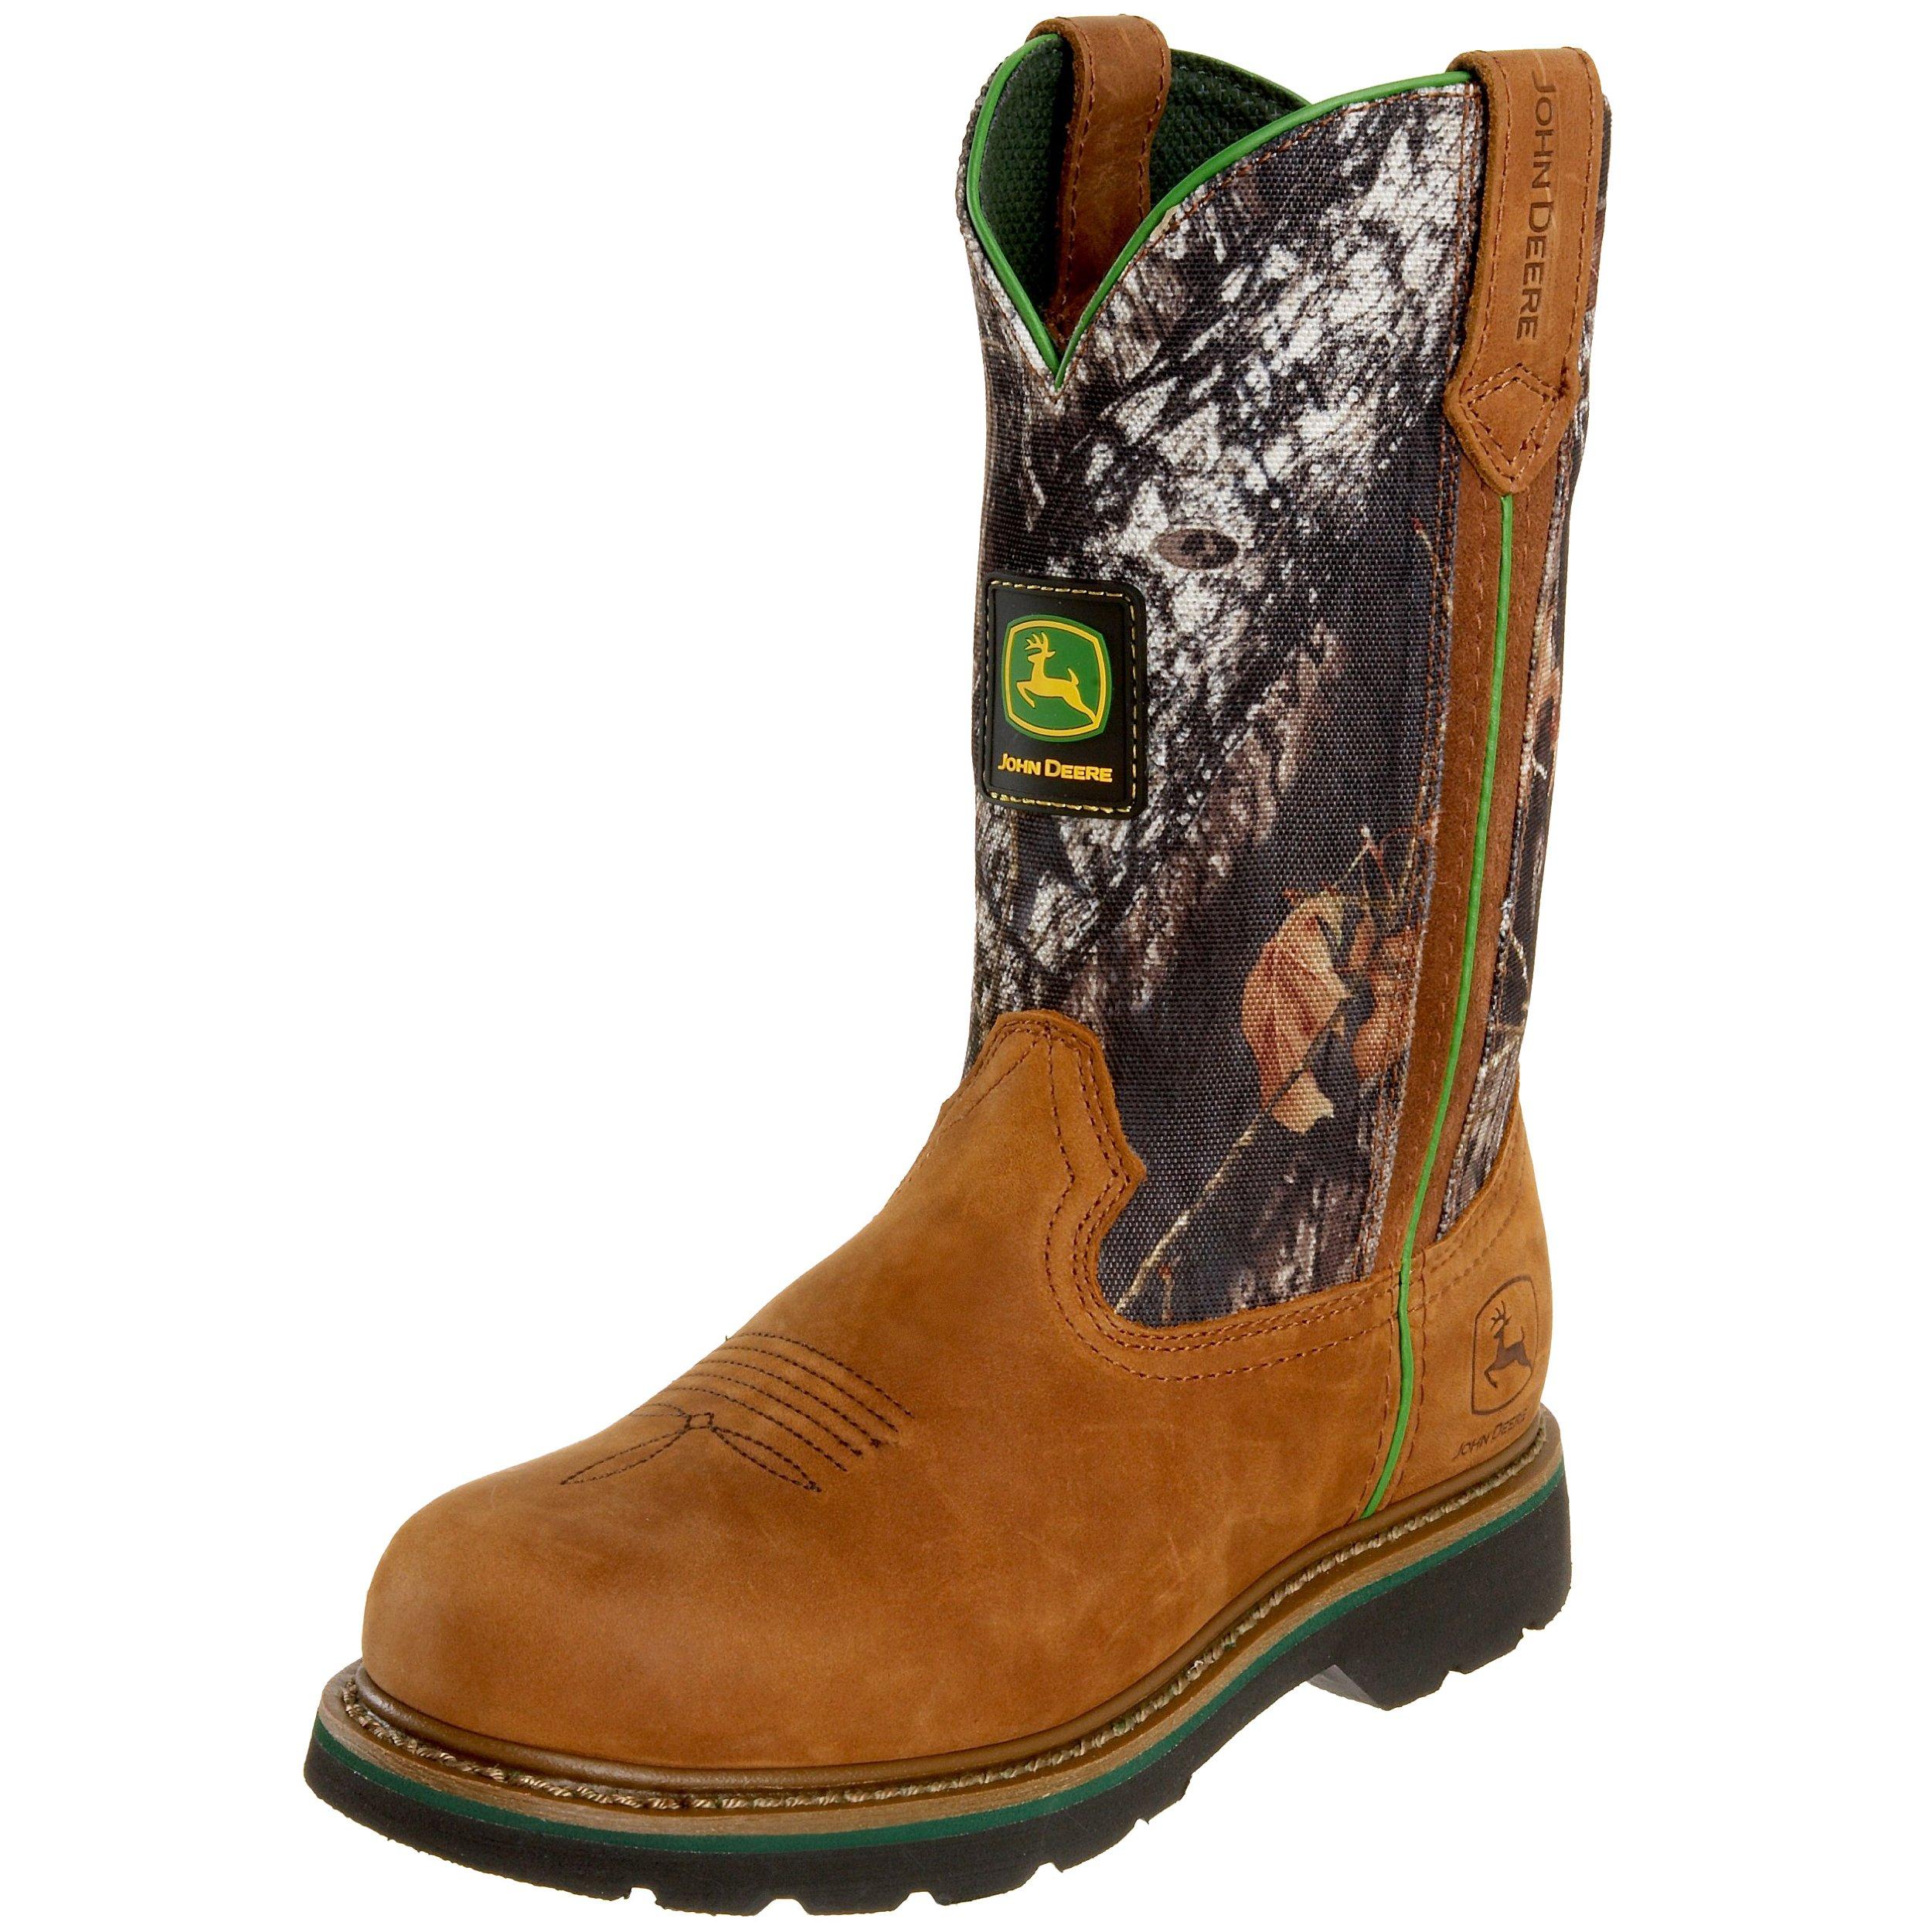 John Deere Women's Wellington JD3288 Boot,Tan/Camo,7 M US